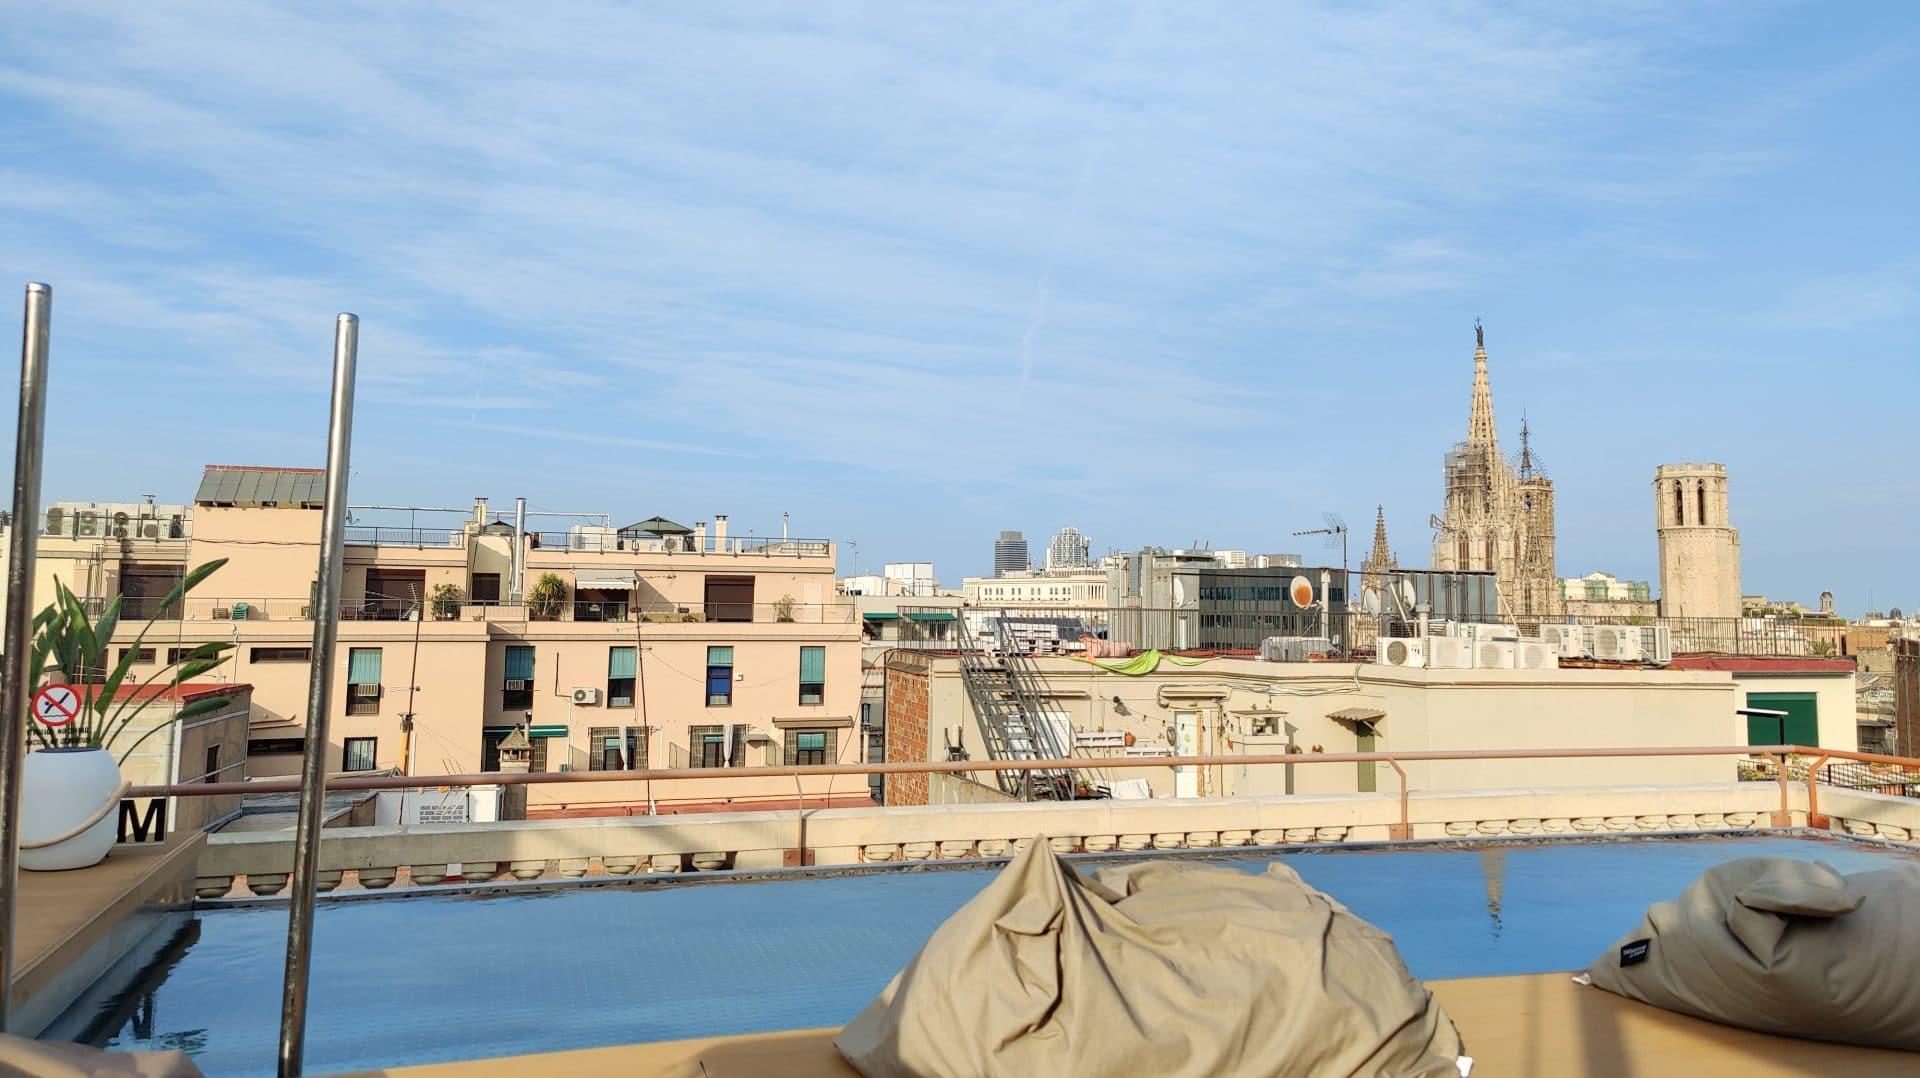 Kimpton Vividora Barcelona Rooftop Pool 3